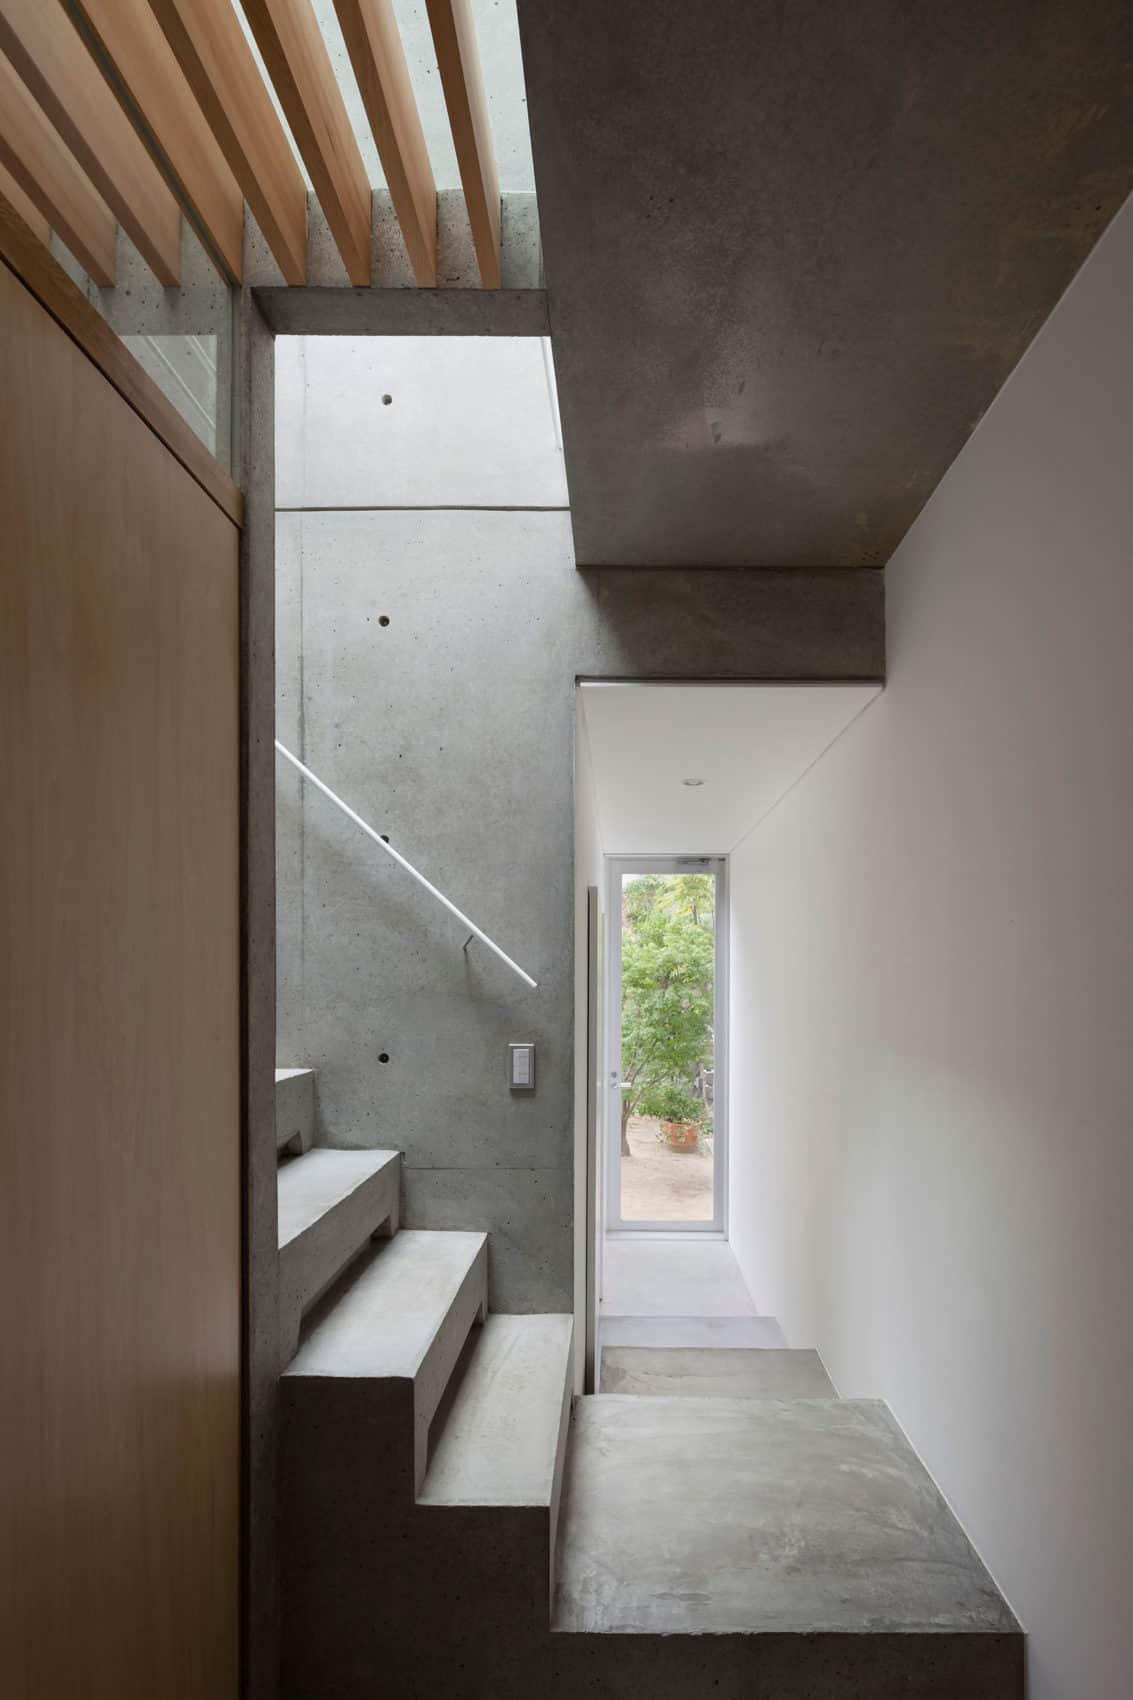 House in Midorigaoka by Yutaka Yoshida Architect (10)